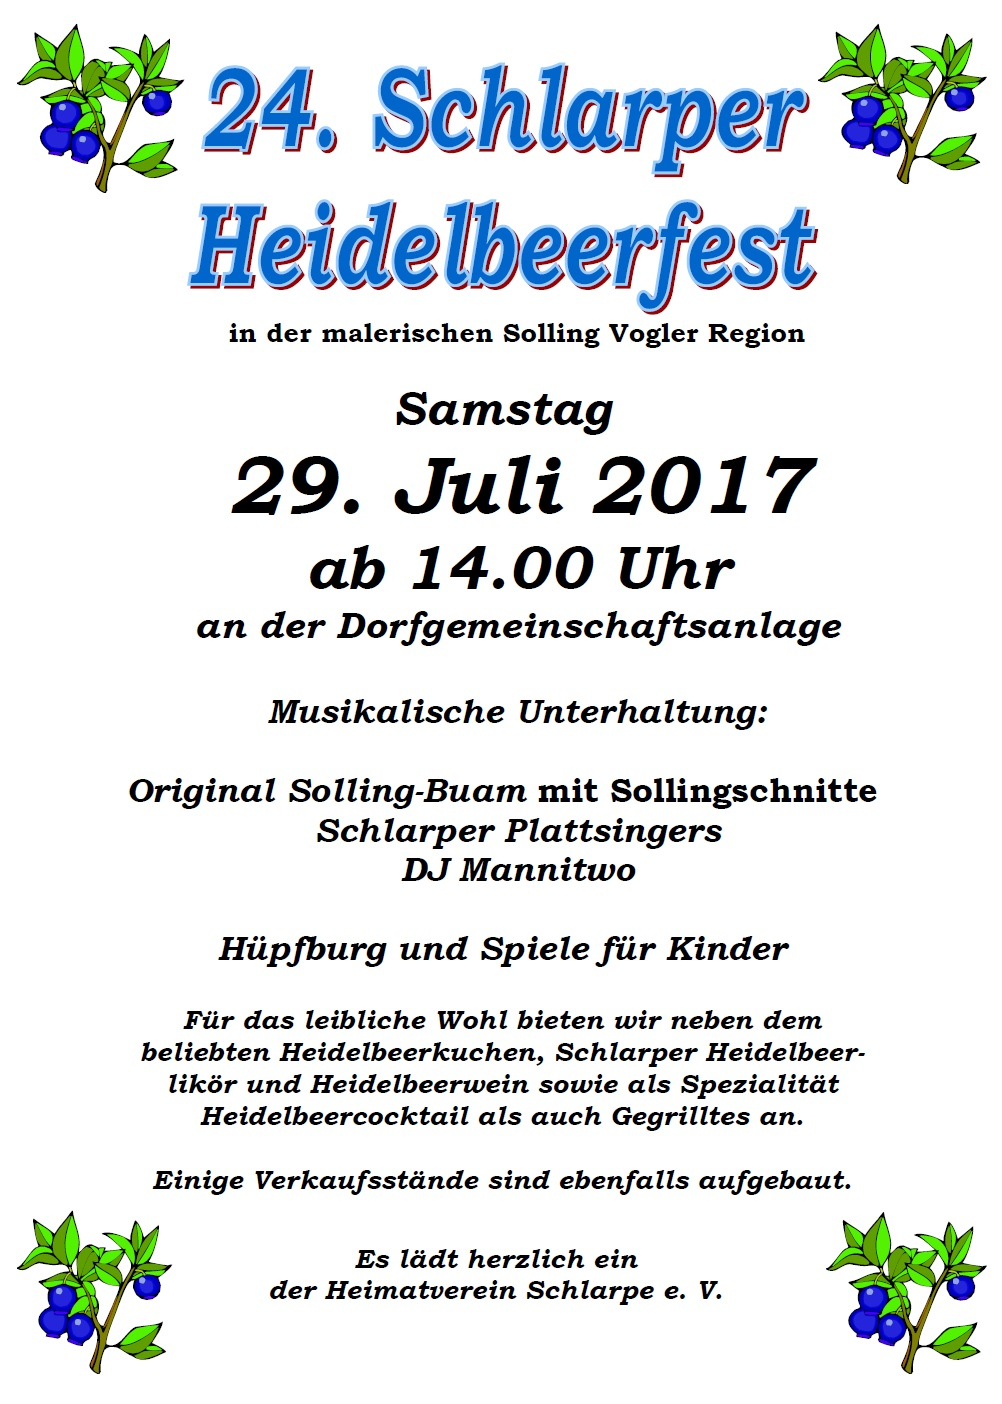 Heidelbeerfest_170729a